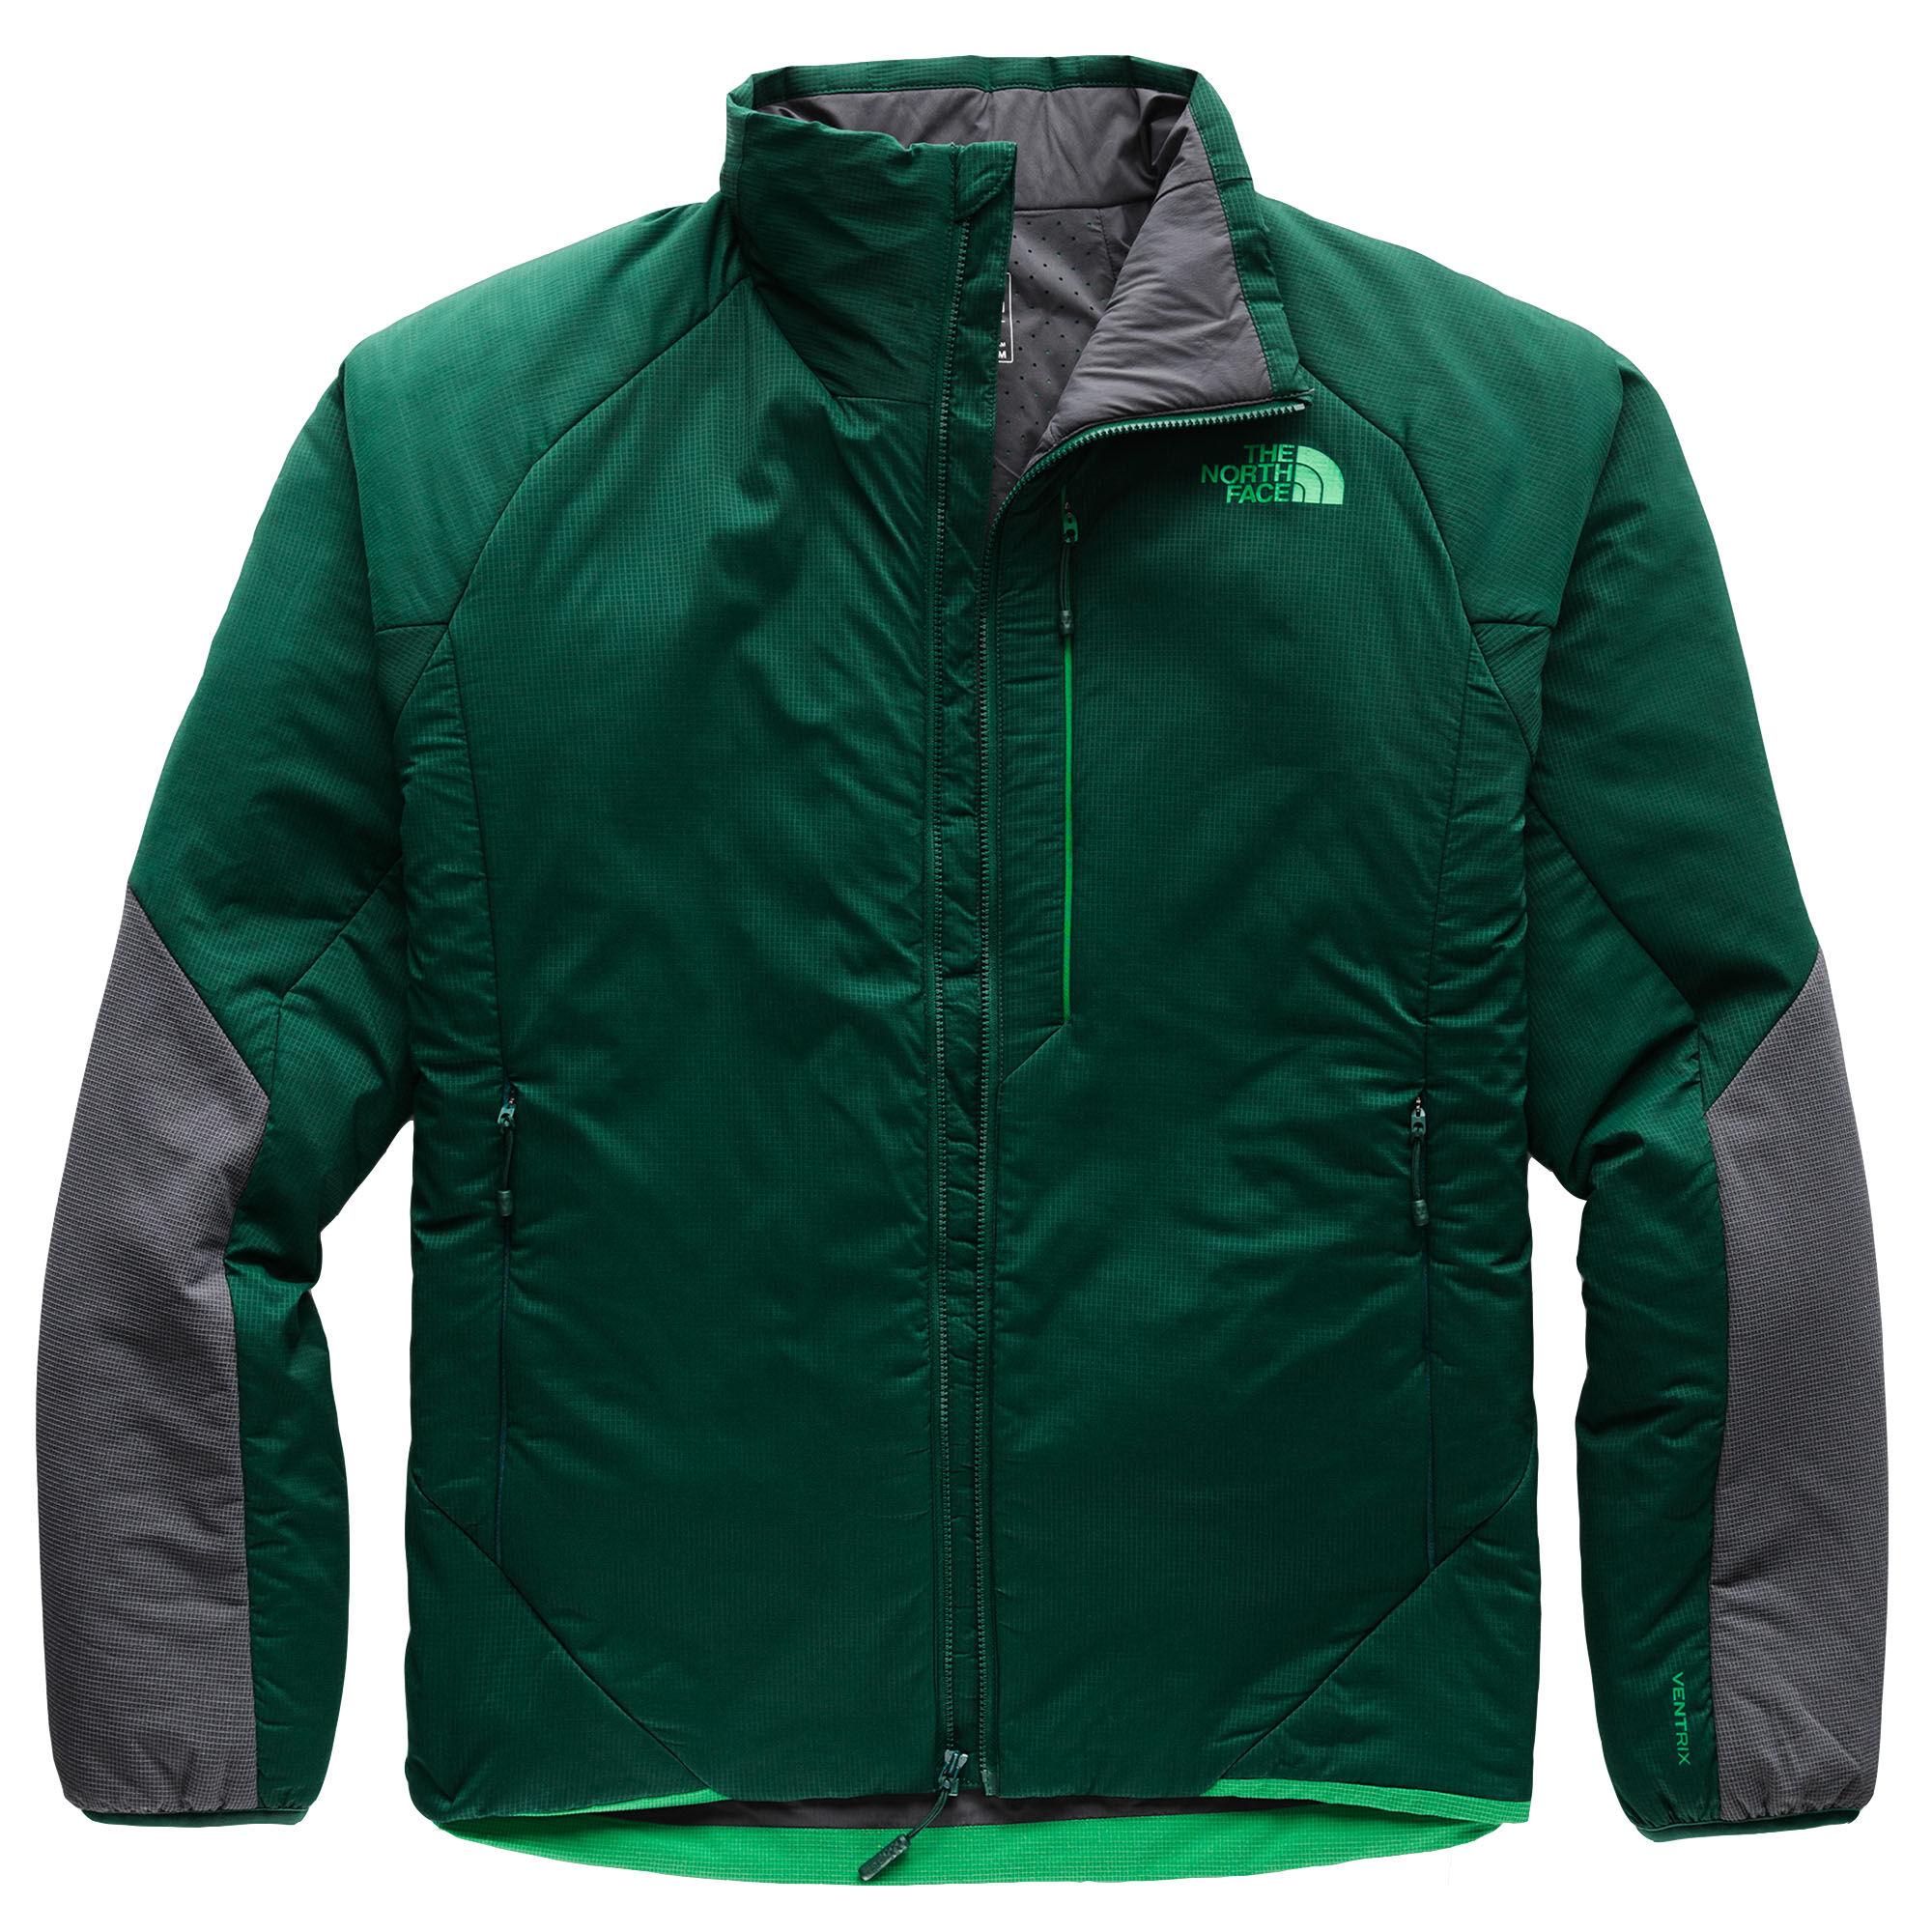 The North Face Men's Ventrix Jacket, Green  - Botanical Garden Green/Vanadis G - Size: Extra Large